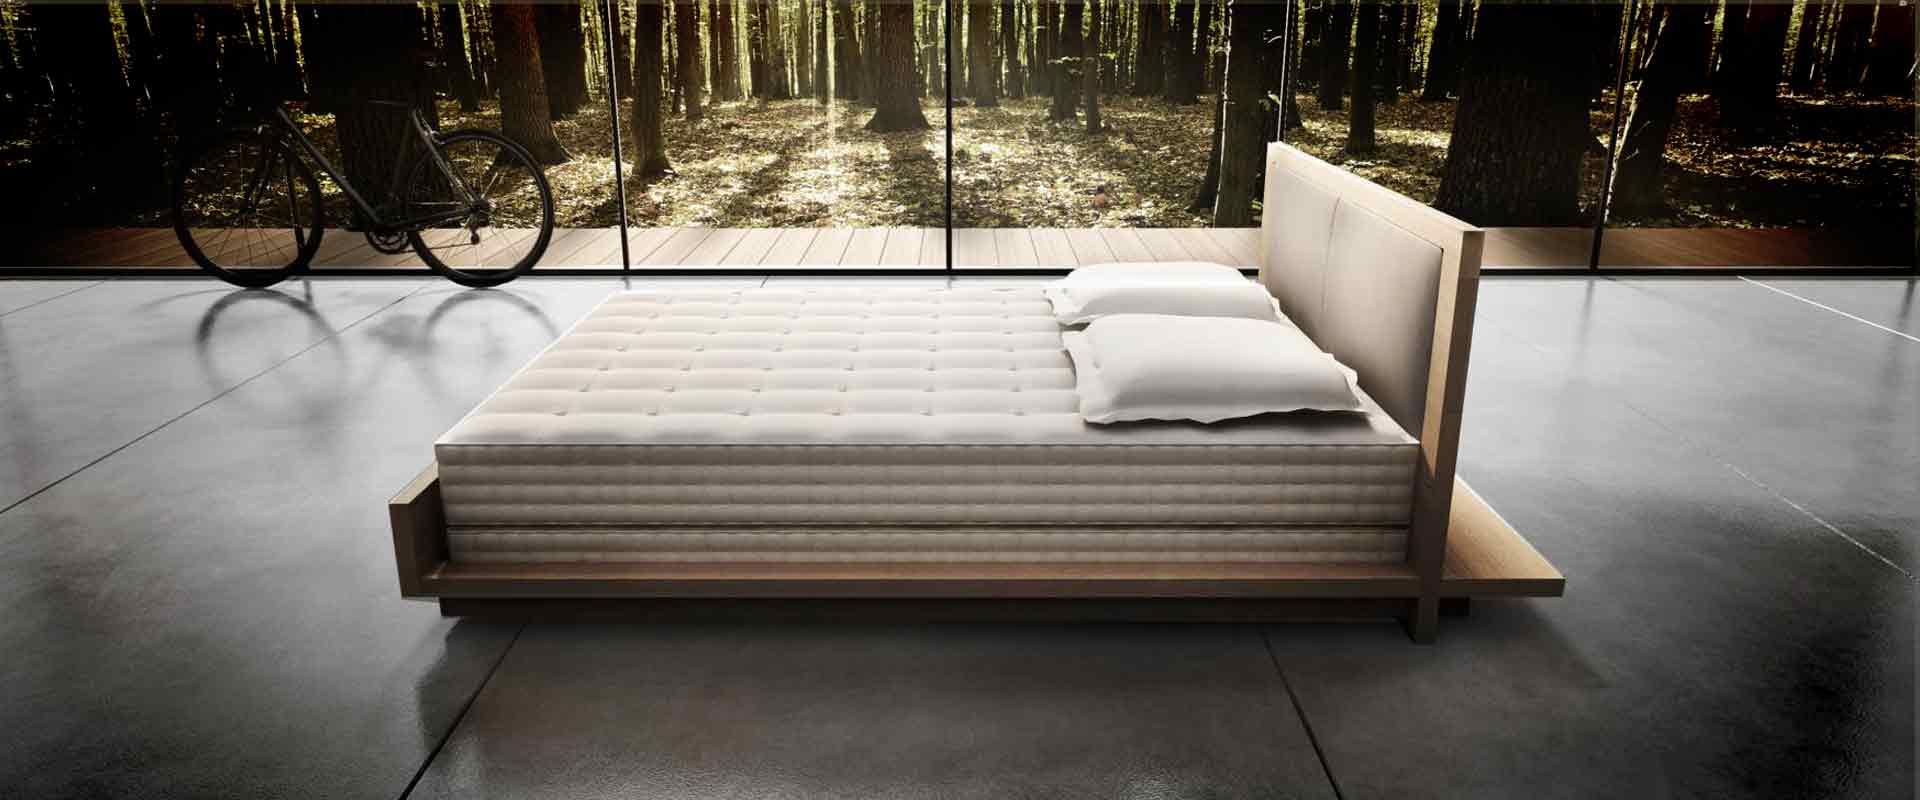 Betten Hoenscheidt Duesseldorf – Massivholzbetten Holzbetten